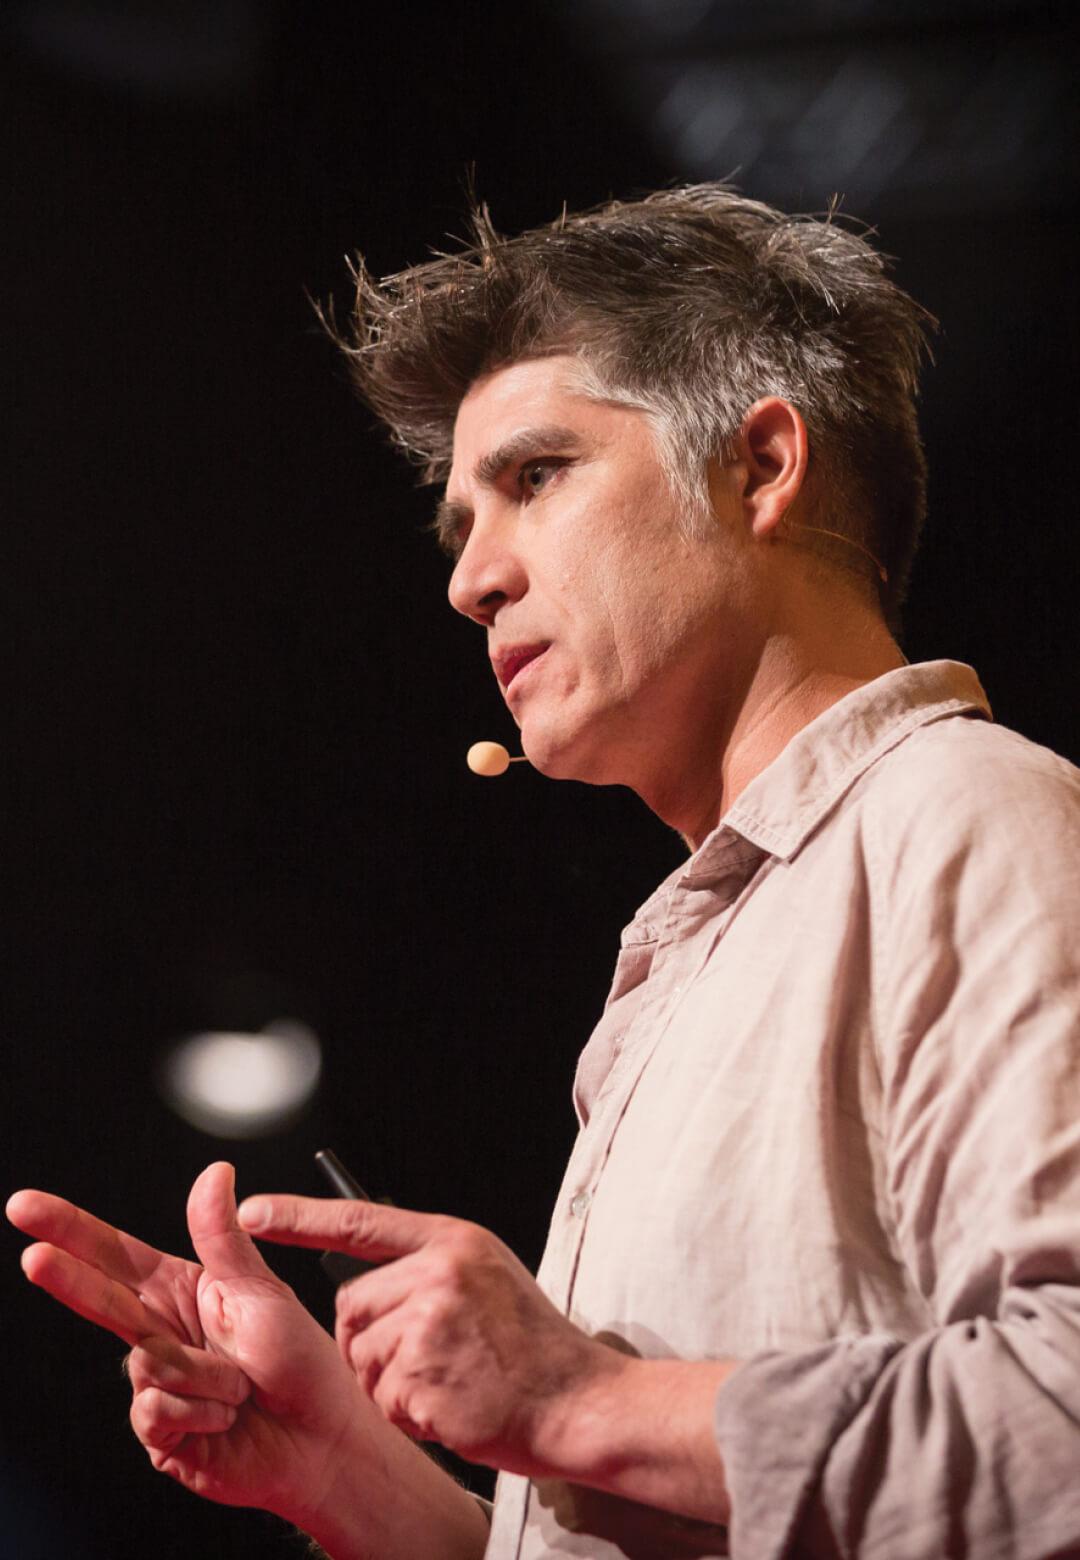 Pritzker Prize laureate Alejandro Aravena giving a presentation   Alejandro Aravena   Pritzker Architecture Prize   STIRworld